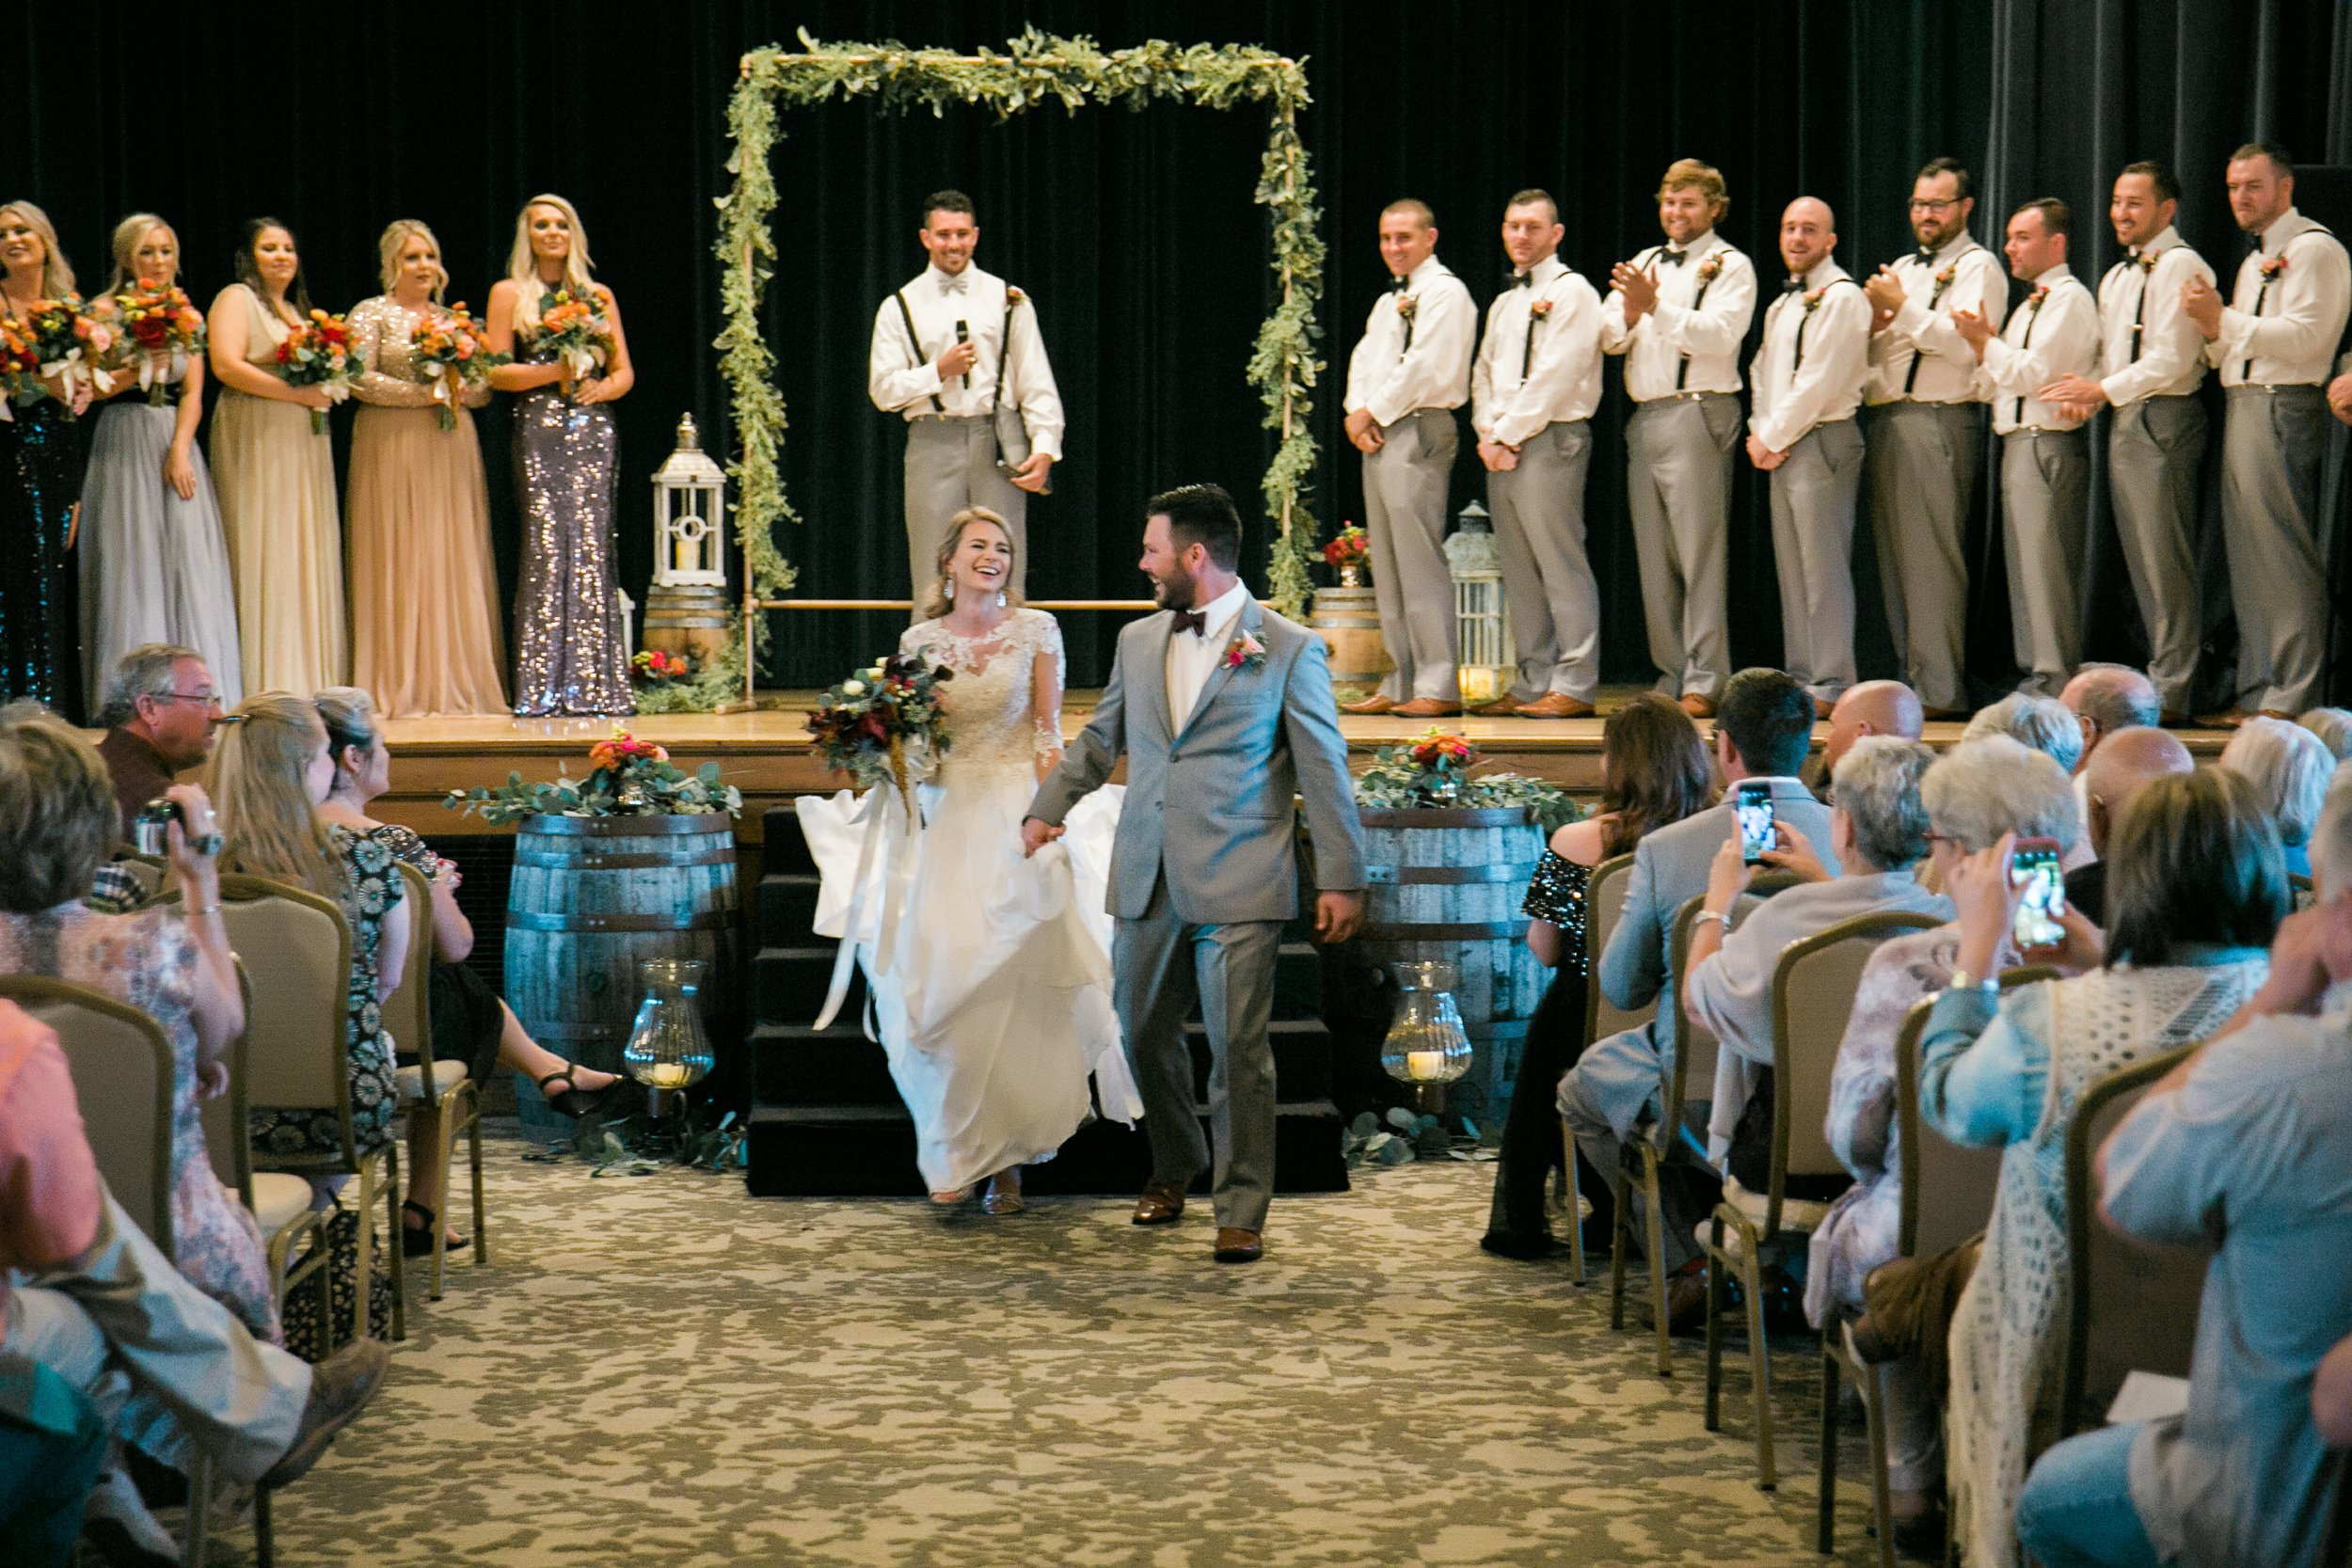 Roberson-Wedding-The-Forum-Lauren-Pinson-Wedding-Photography-Wichita-Falls-Texas-078.jpg